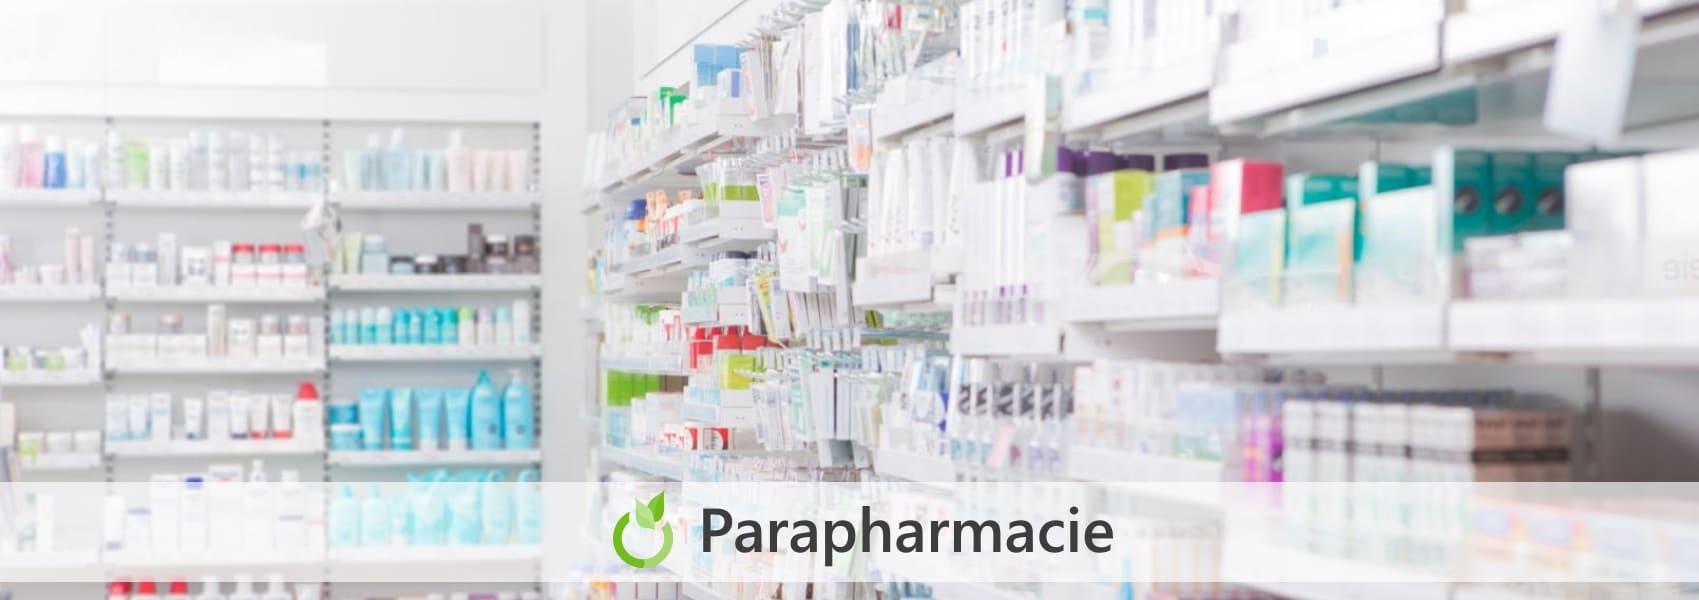 parapharmacie en pharmacie à Canteleu